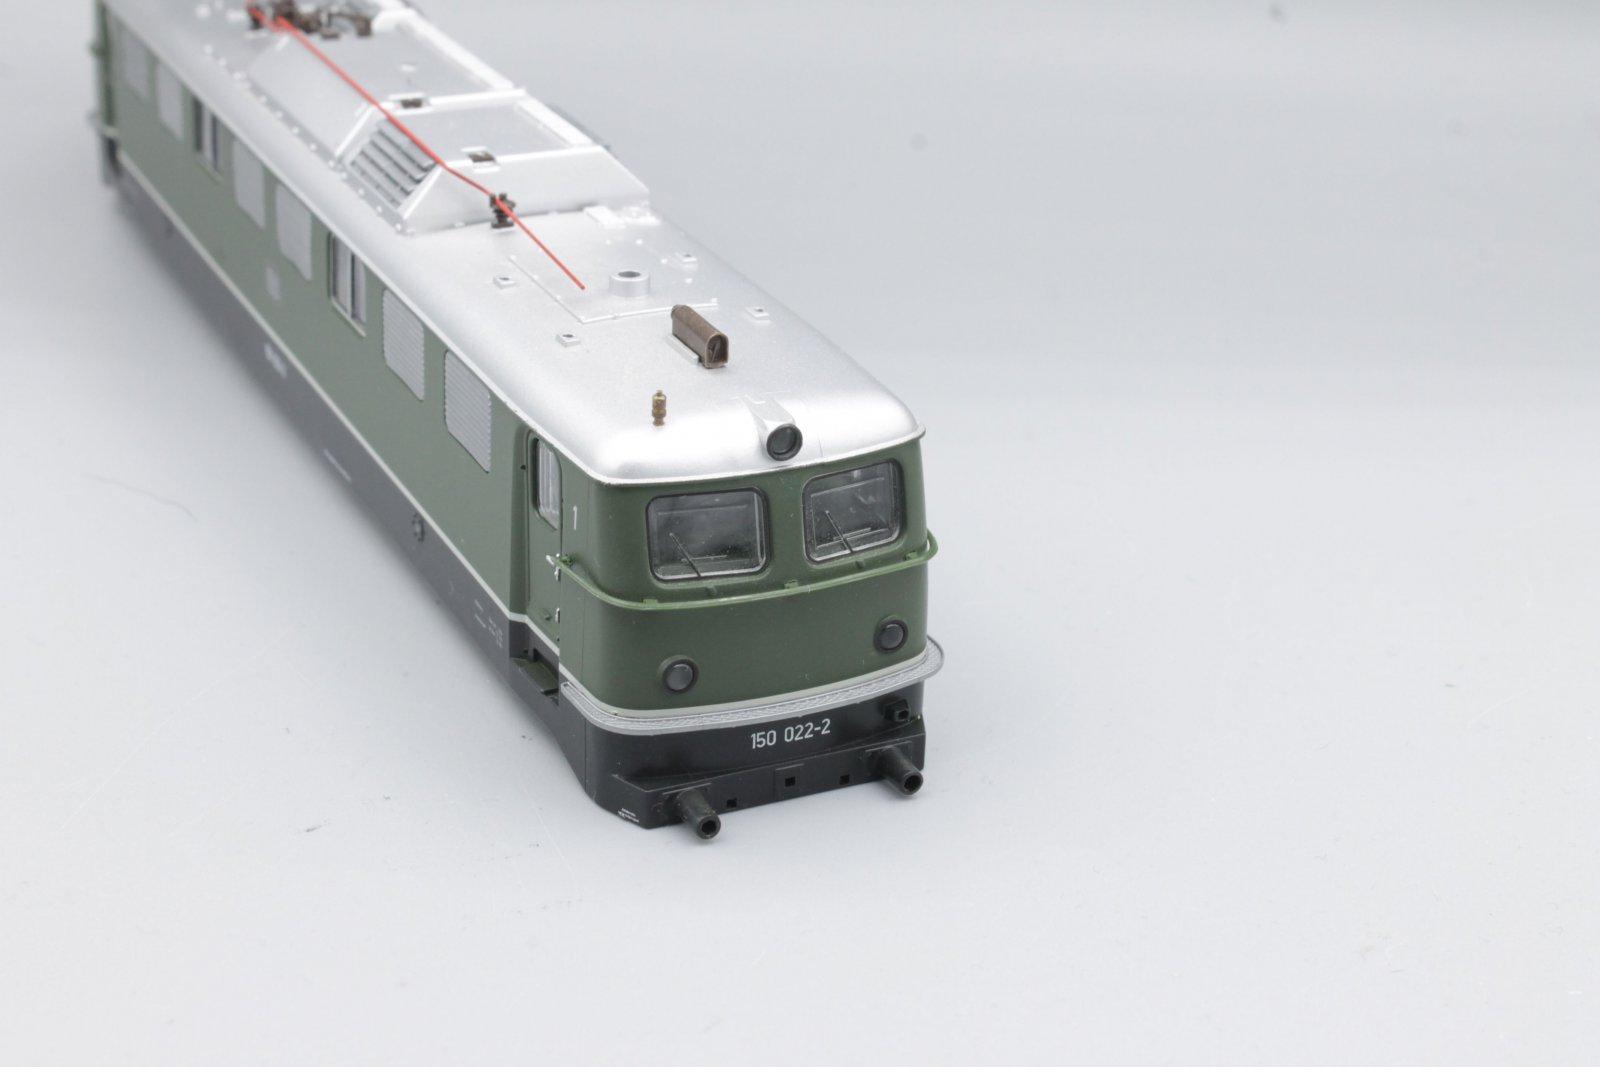 63710 Ersatzteil Roco HO E-Lok BR 150 111-3 DB Kardanwelle*